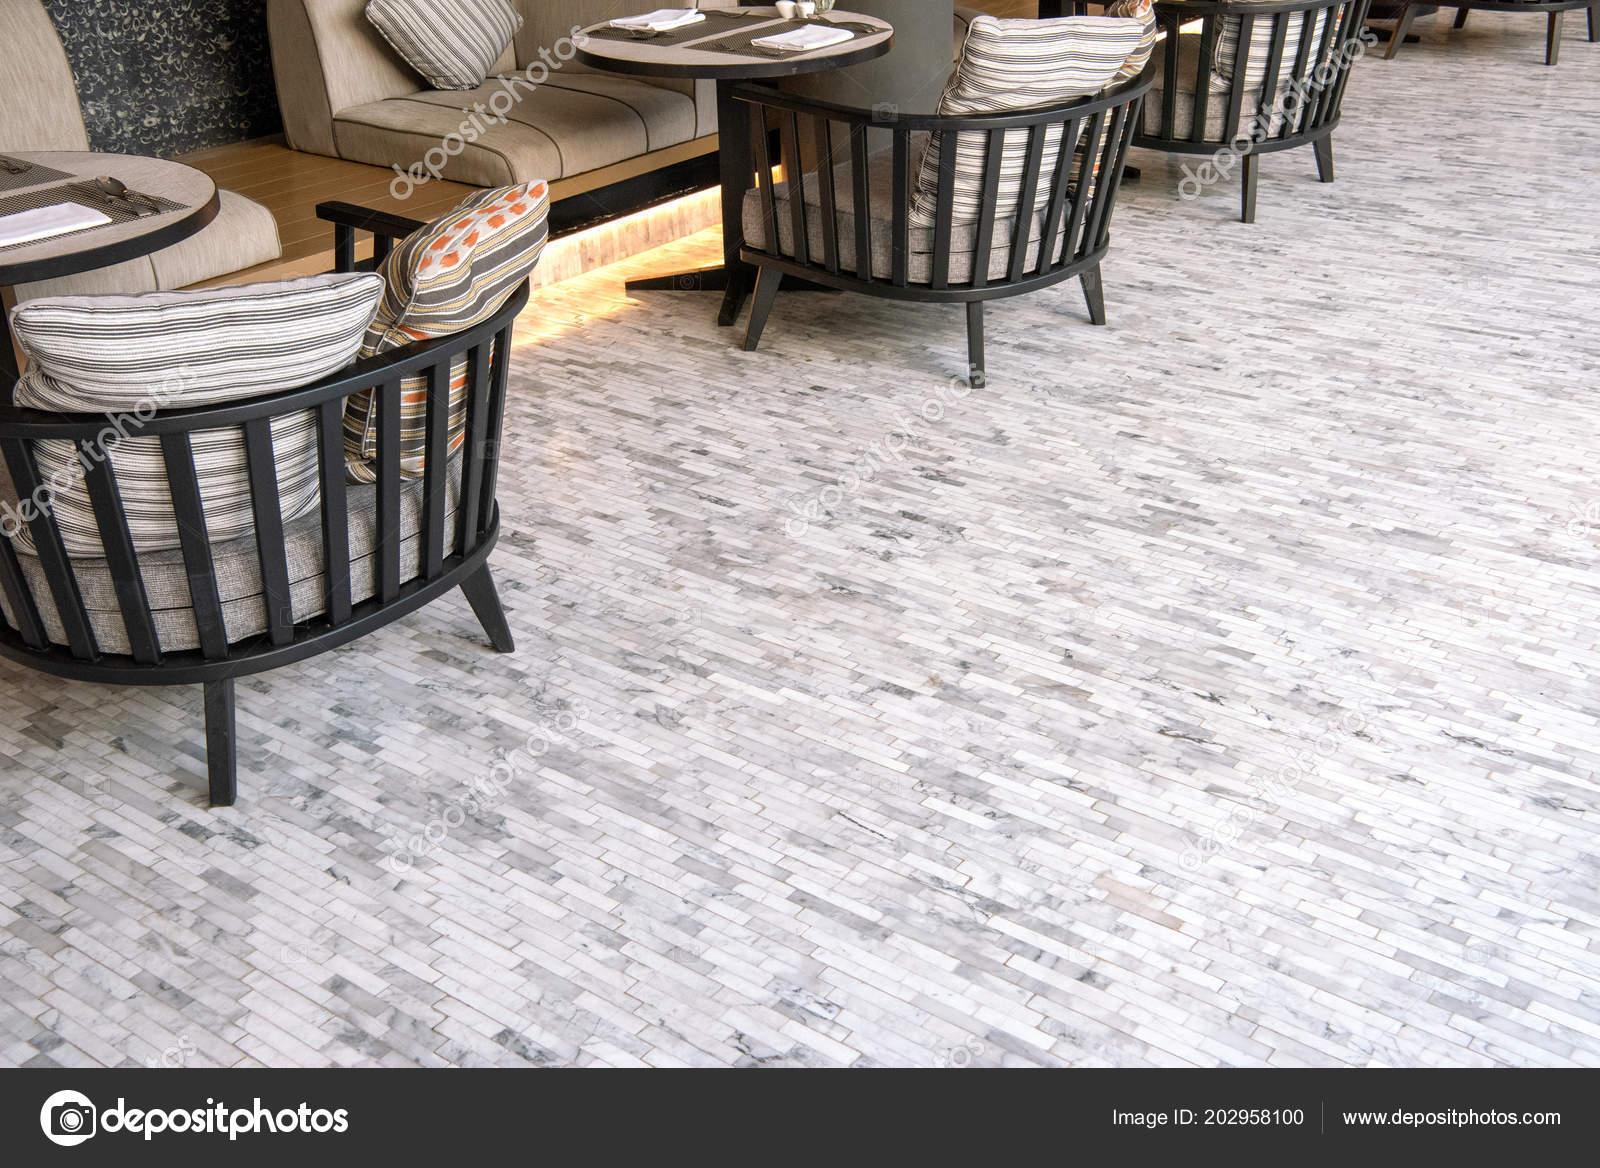 White Marble Tile Flooring Outdoor Living Room Stock Photo C Kitthanes R Hotmail Com 202958100